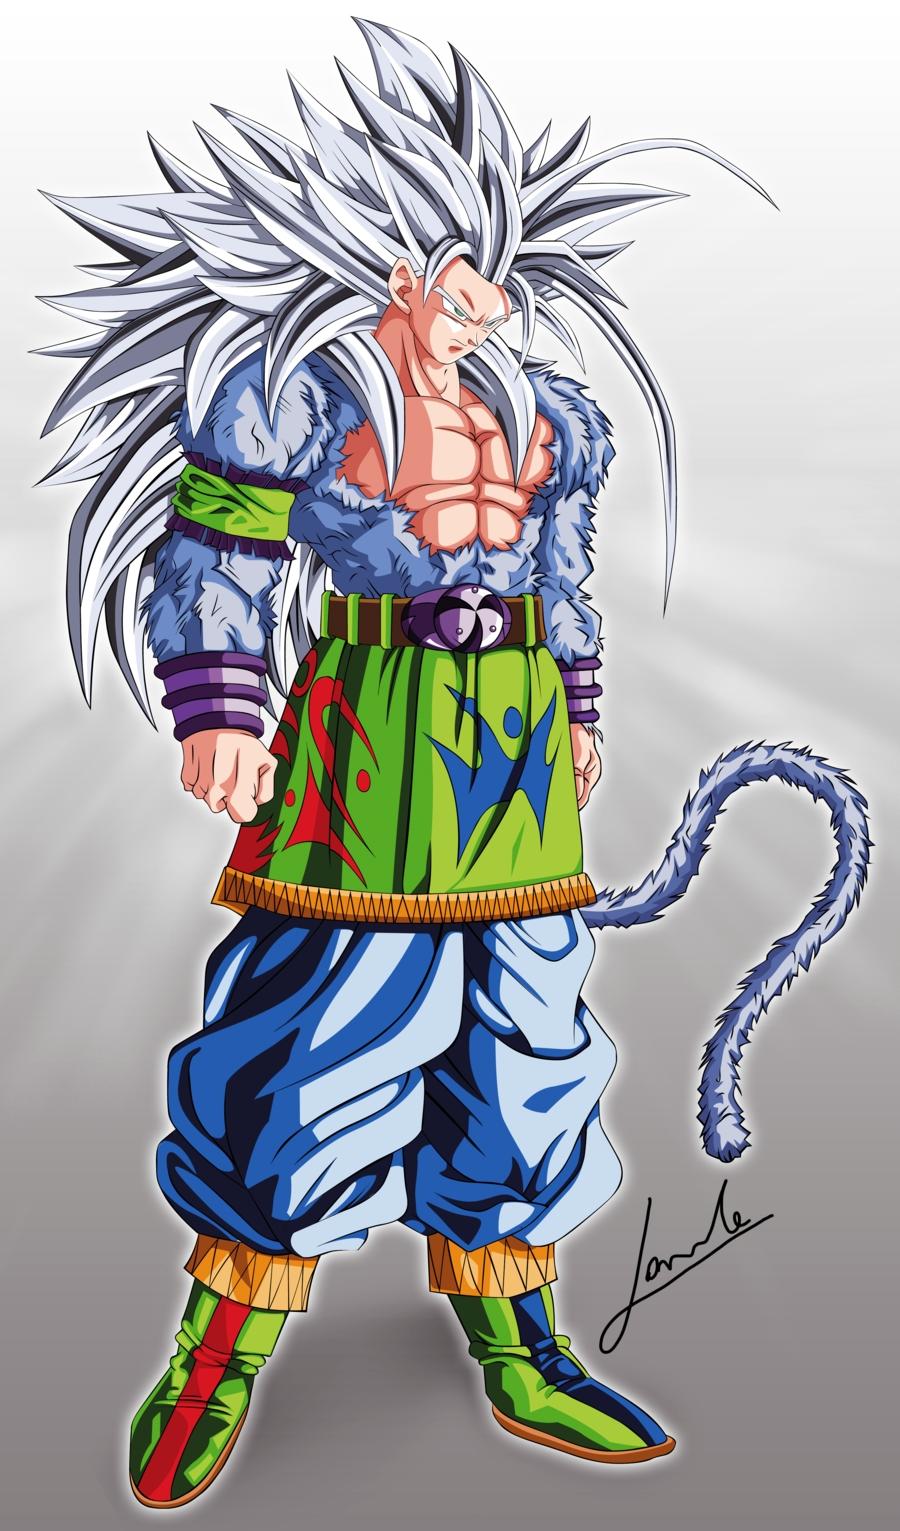 Super Saiyan 5 Dragon Ball Zerochan Anime Image Board